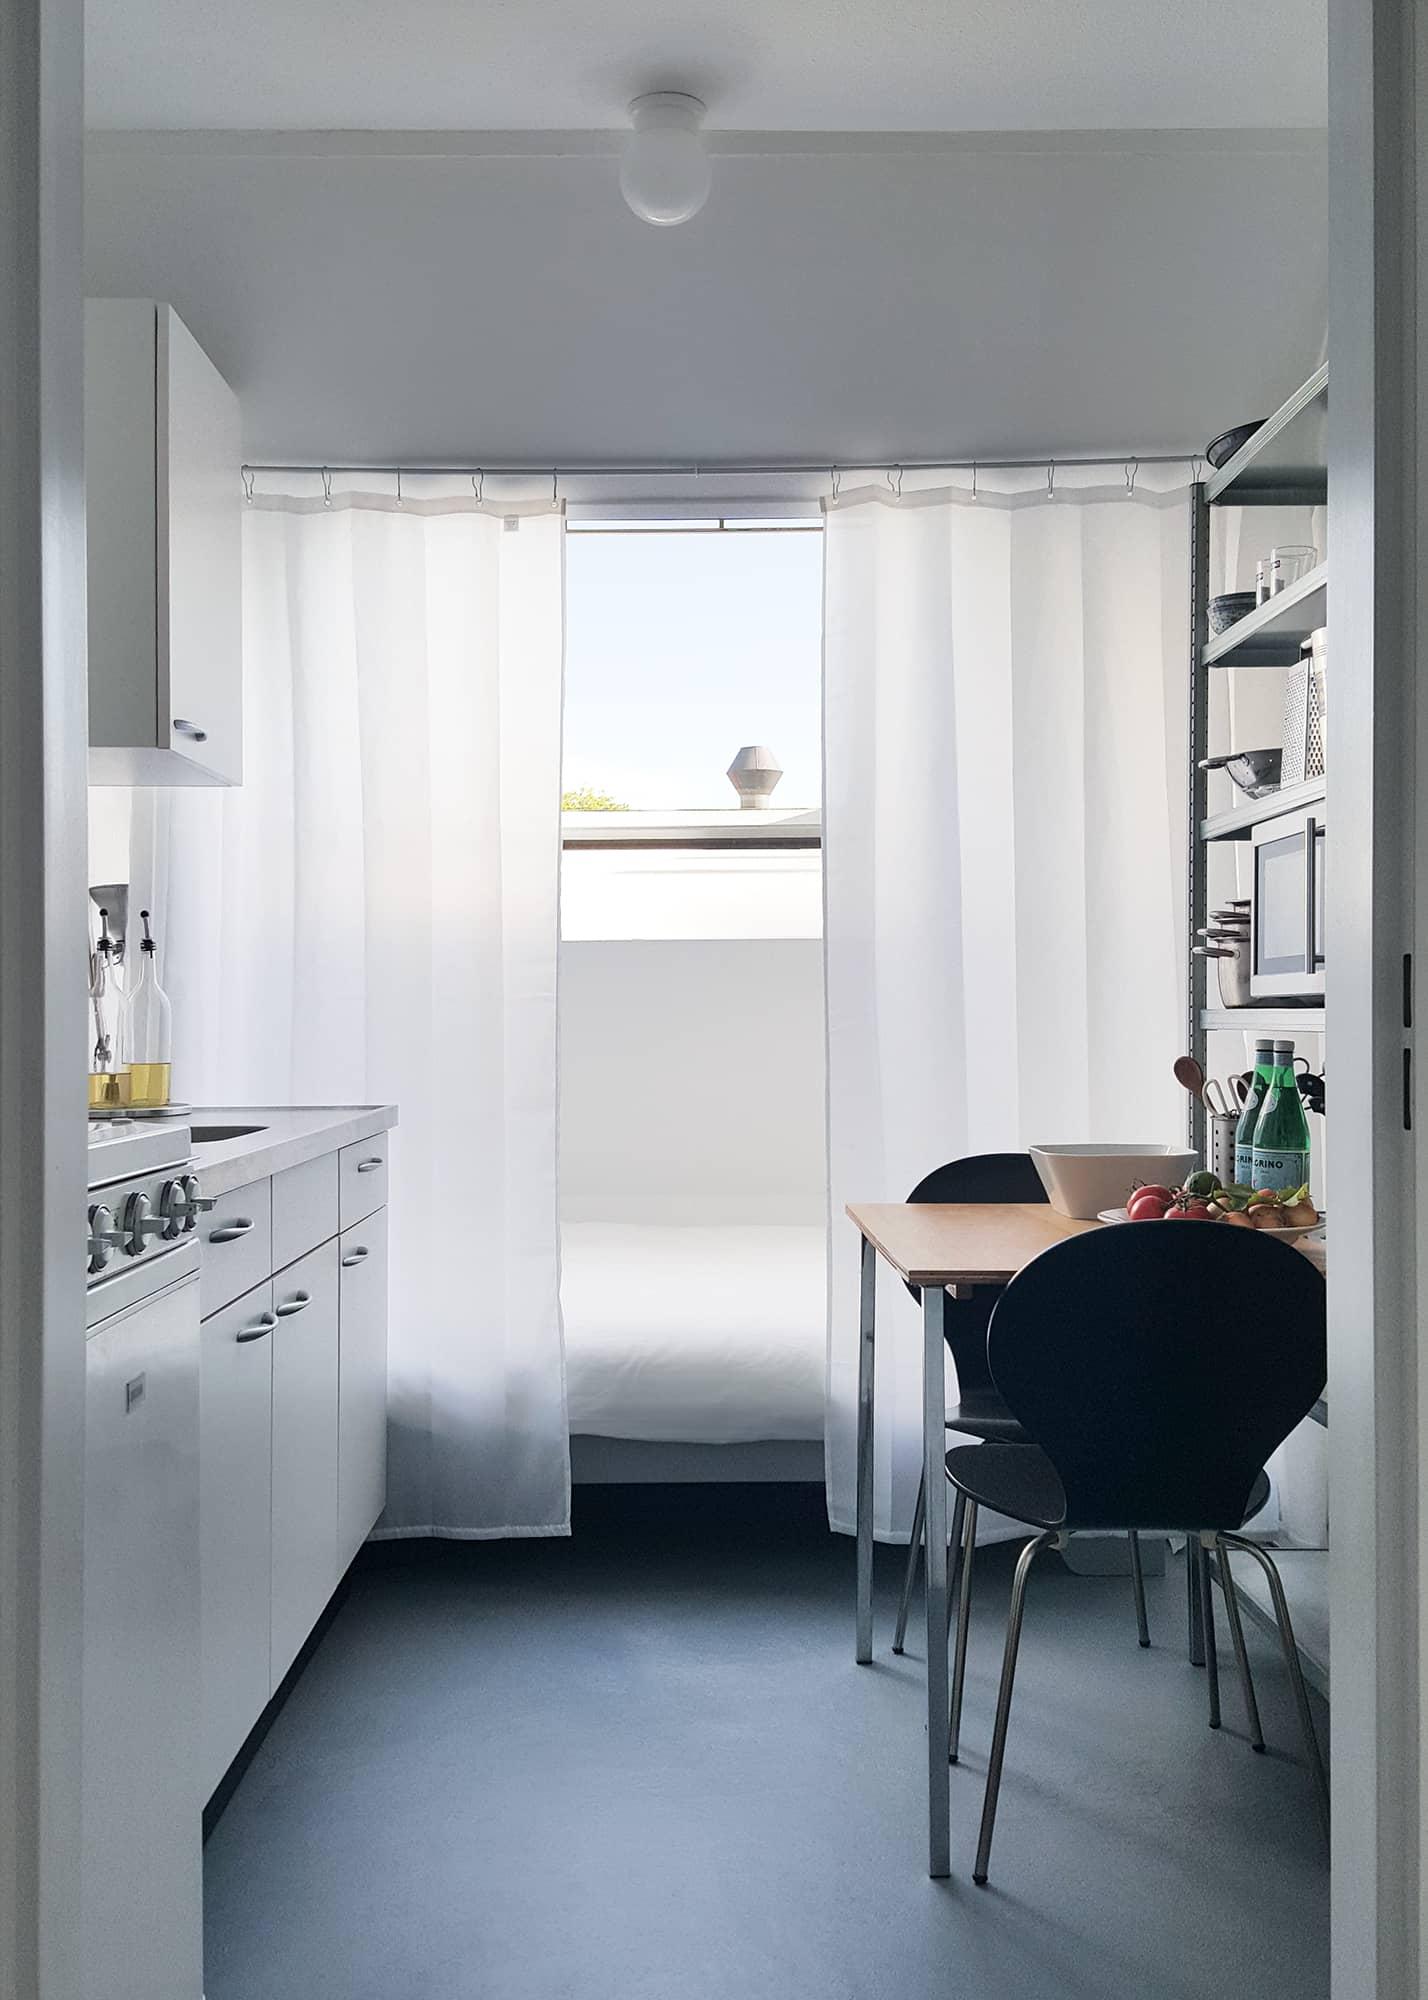 House Tour: A Modern, Minimal Amsterdam Studio | Apartment Therapy